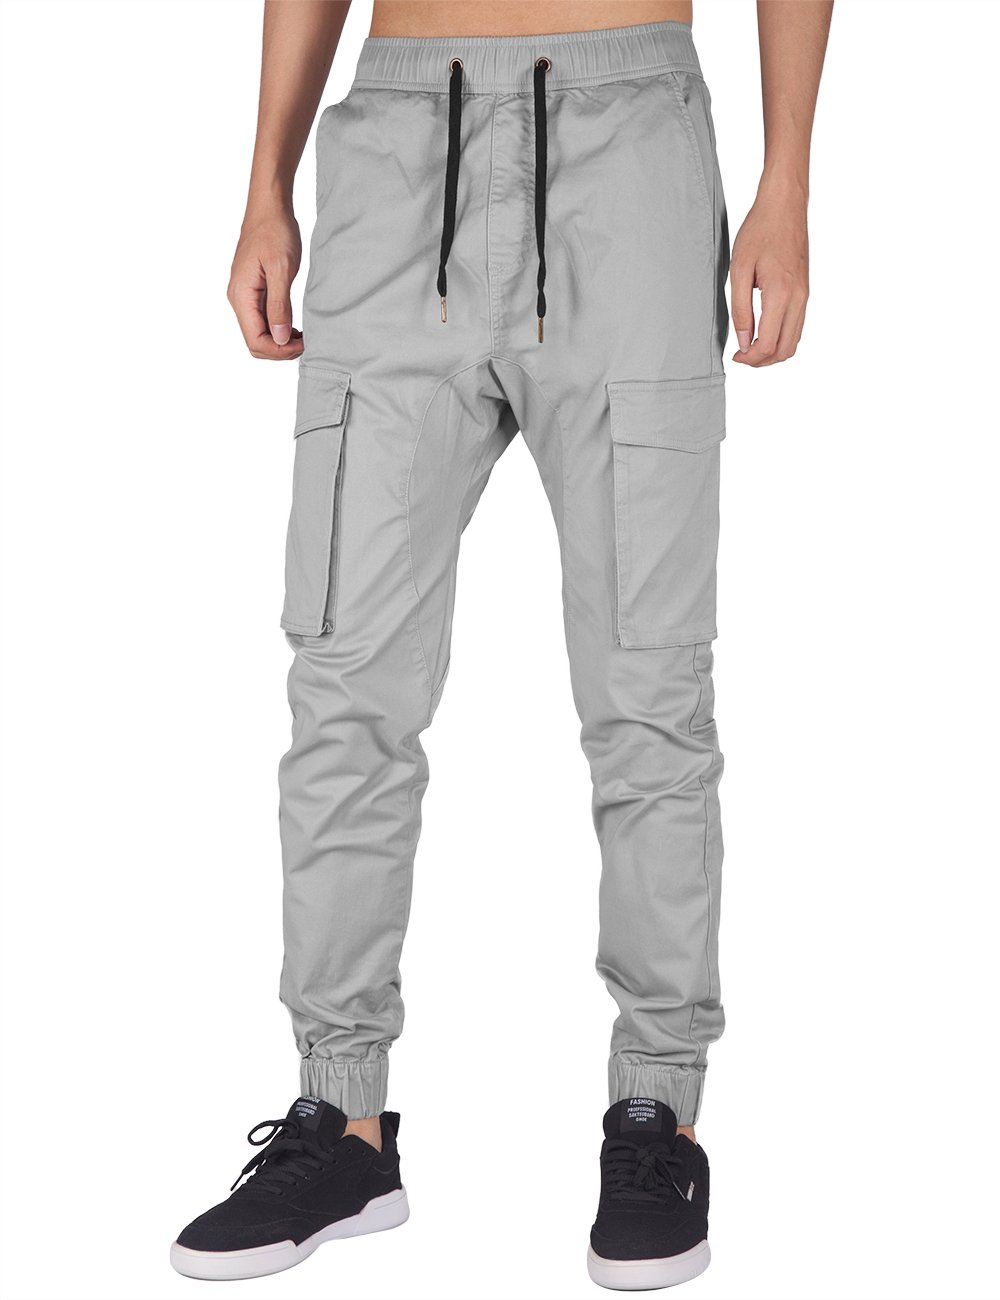 ITALY MORN Men's Jogger Cargo Pants Elastic Waist (Light Grey, S)